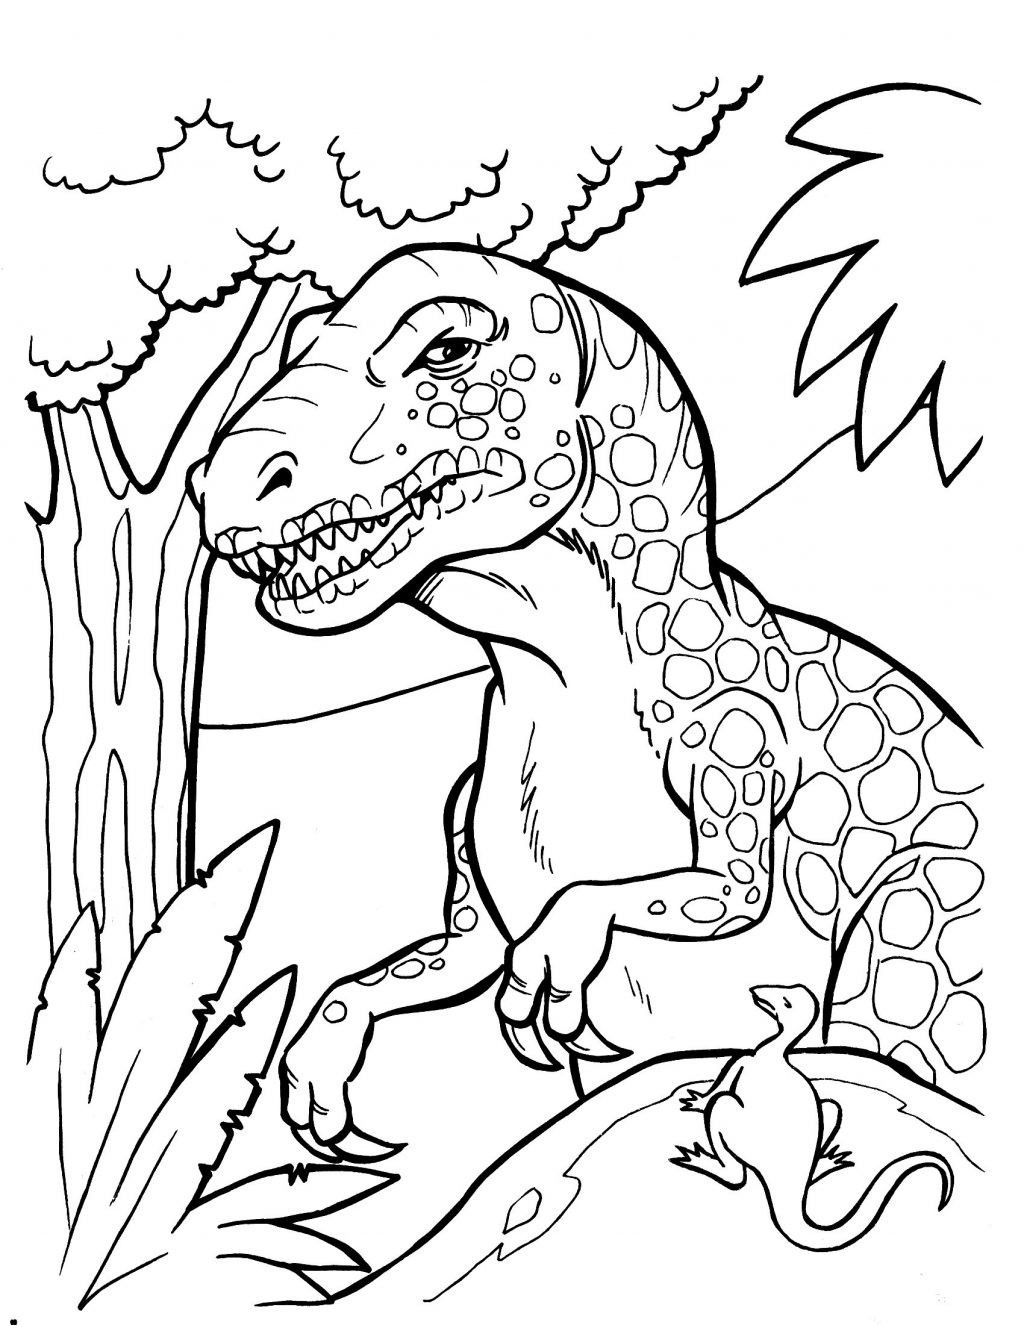 10 dinosaur coloring books, dinosaur coloring games online, dinosaur ...